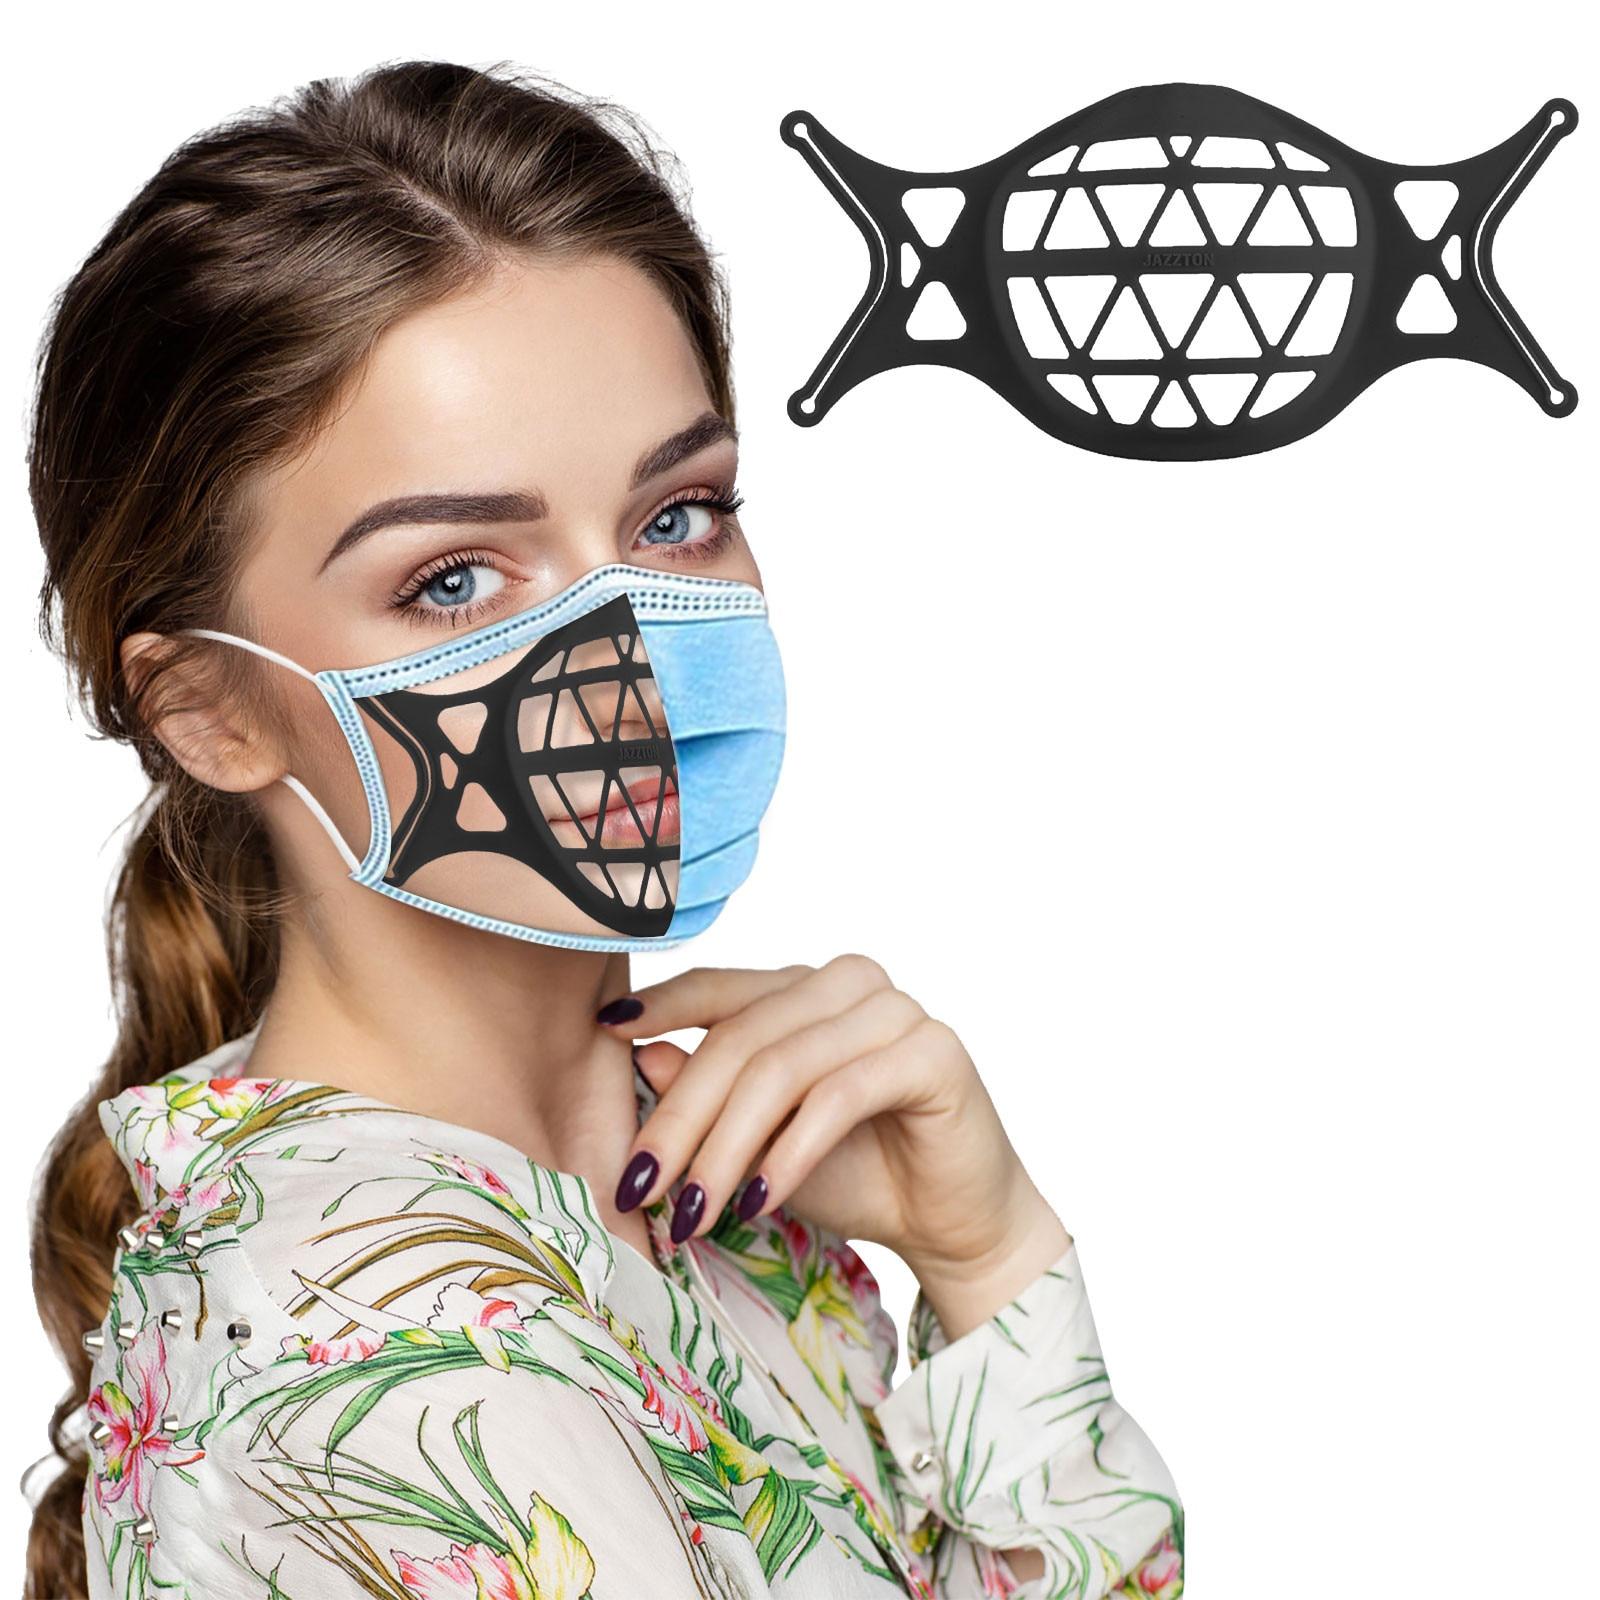 3D Face Mask Bracket Unisex Reusable Silicone Face Mask Bracket Dustproof Mask Bracket Inner Support Frame Face Cover Holder